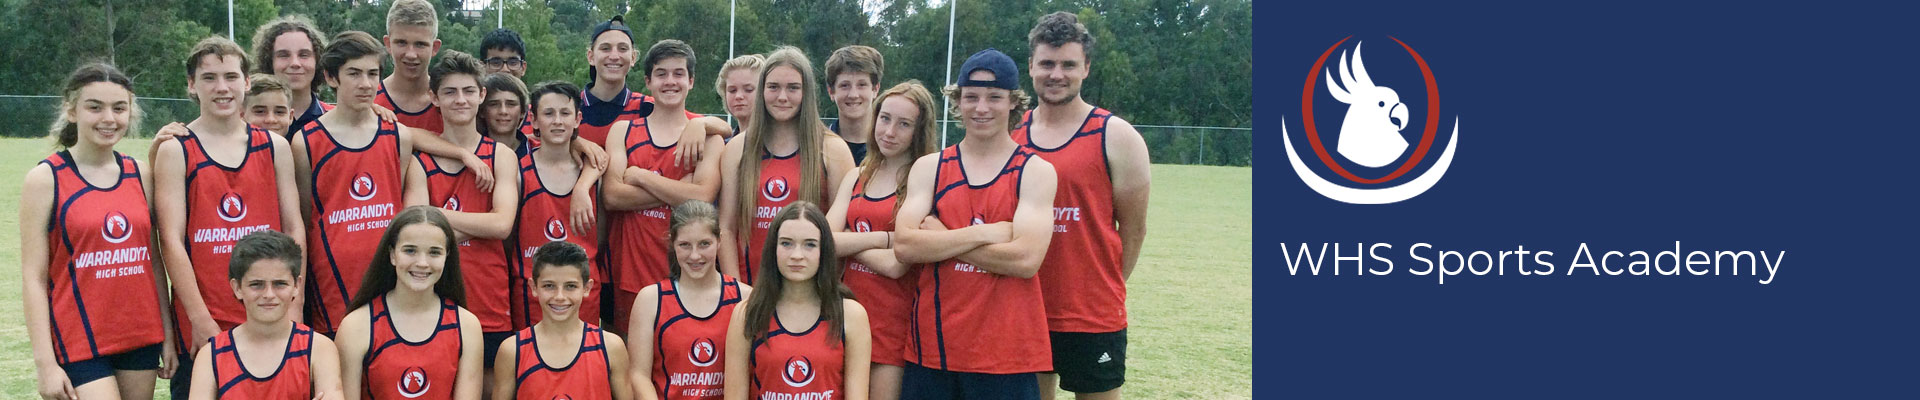 sports academy at Warrandyte High